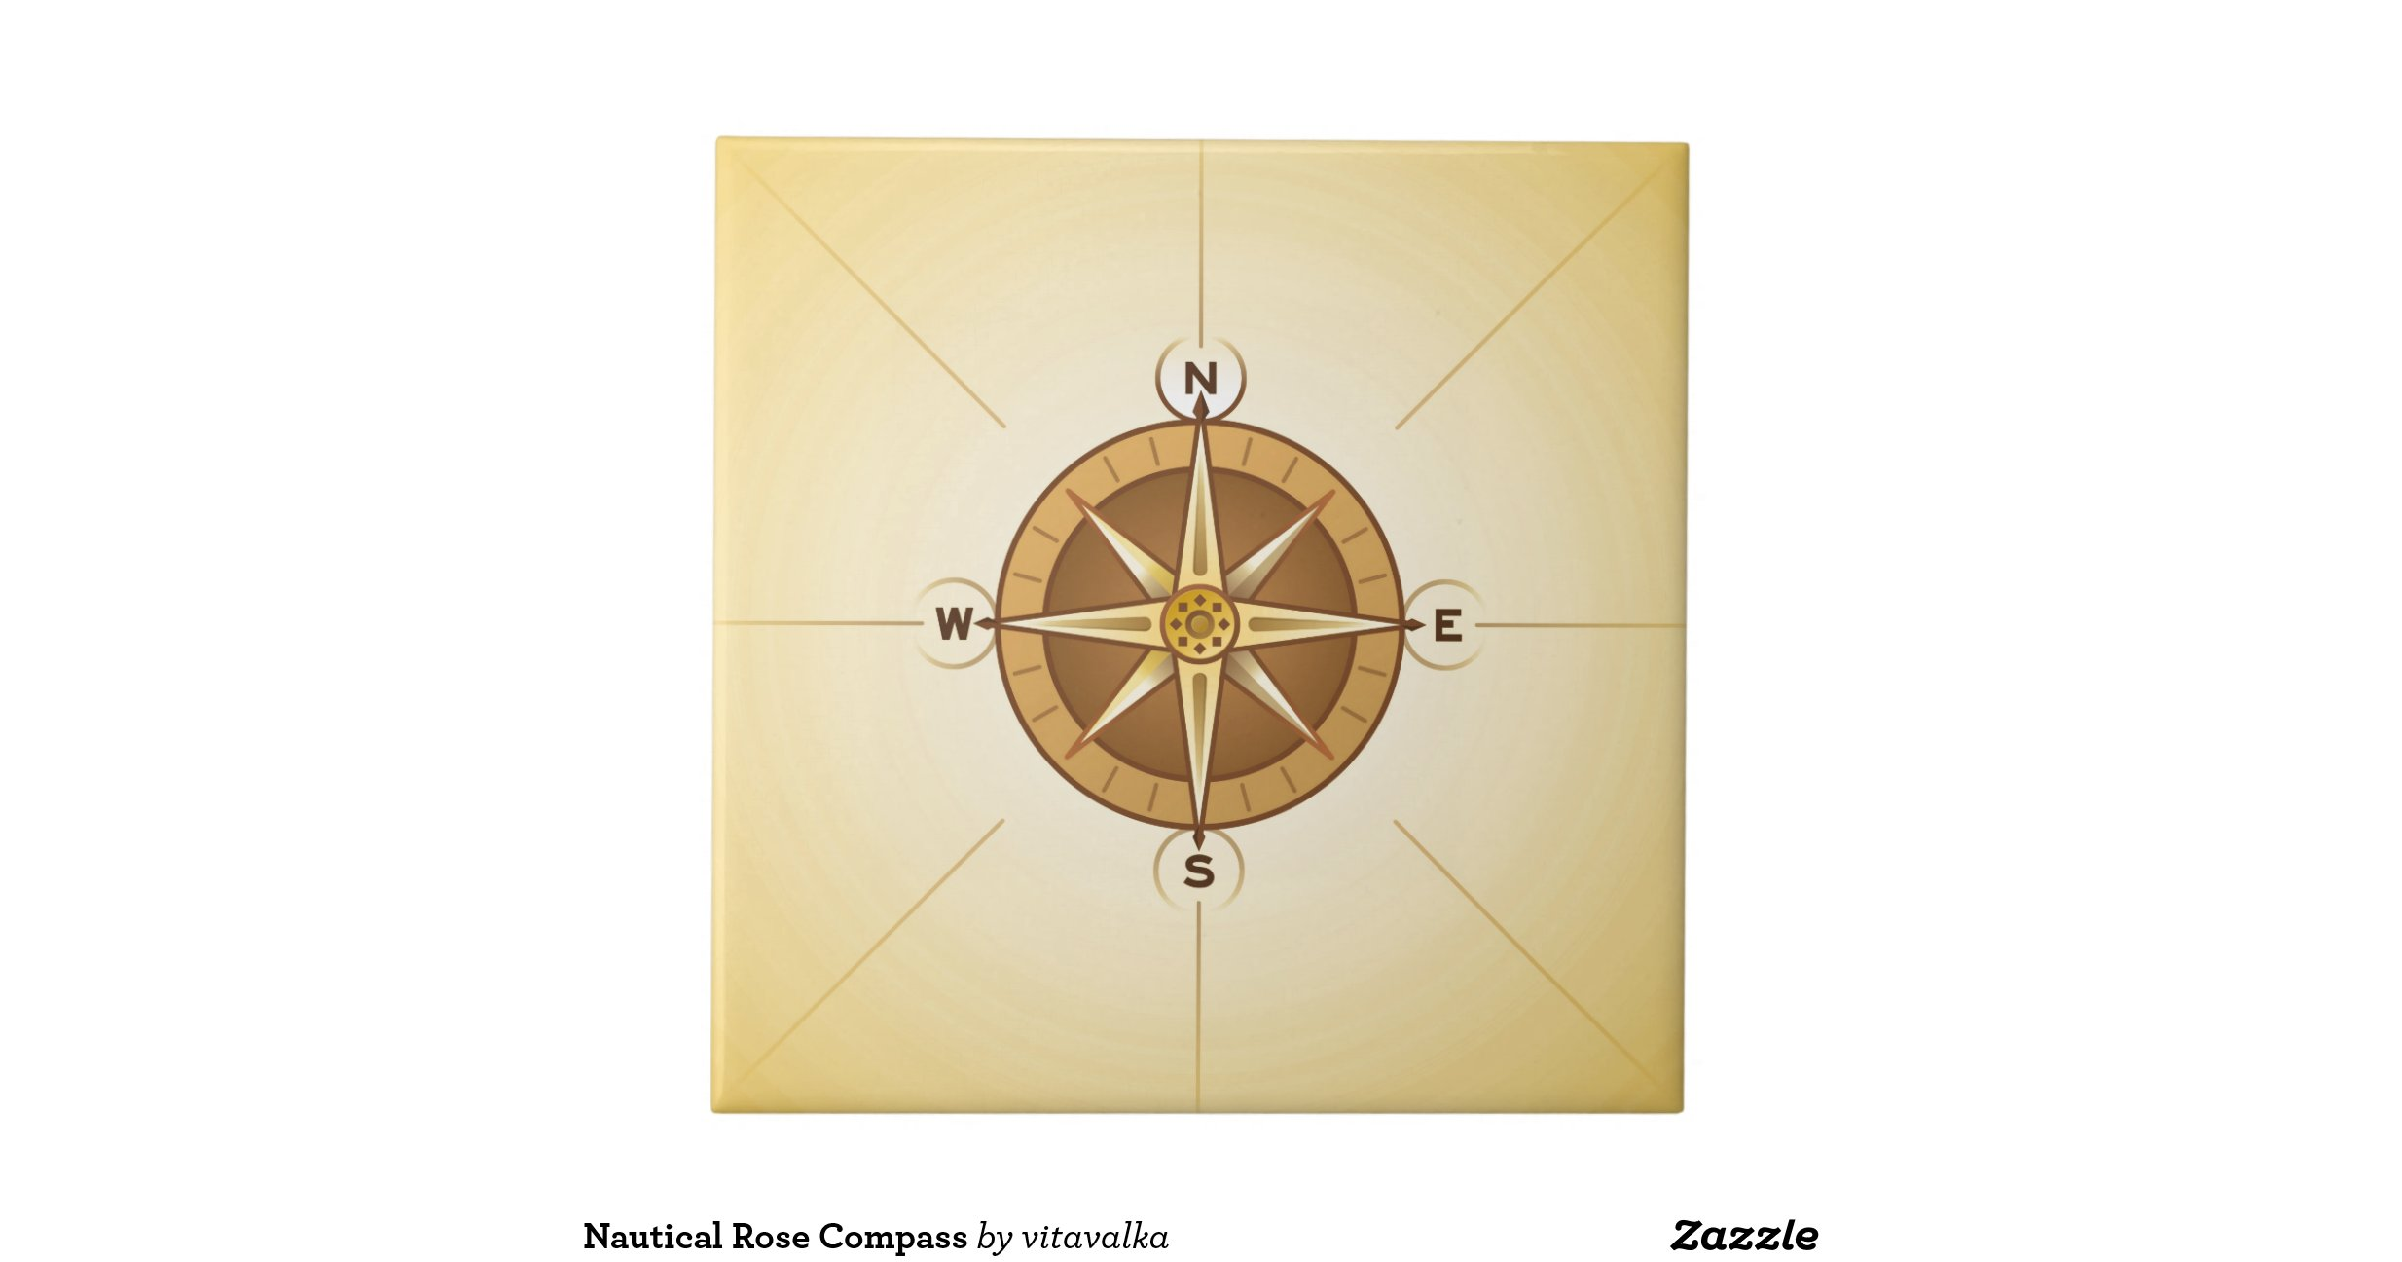 nautical rose compass ceramic tiles zazzle. Black Bedroom Furniture Sets. Home Design Ideas